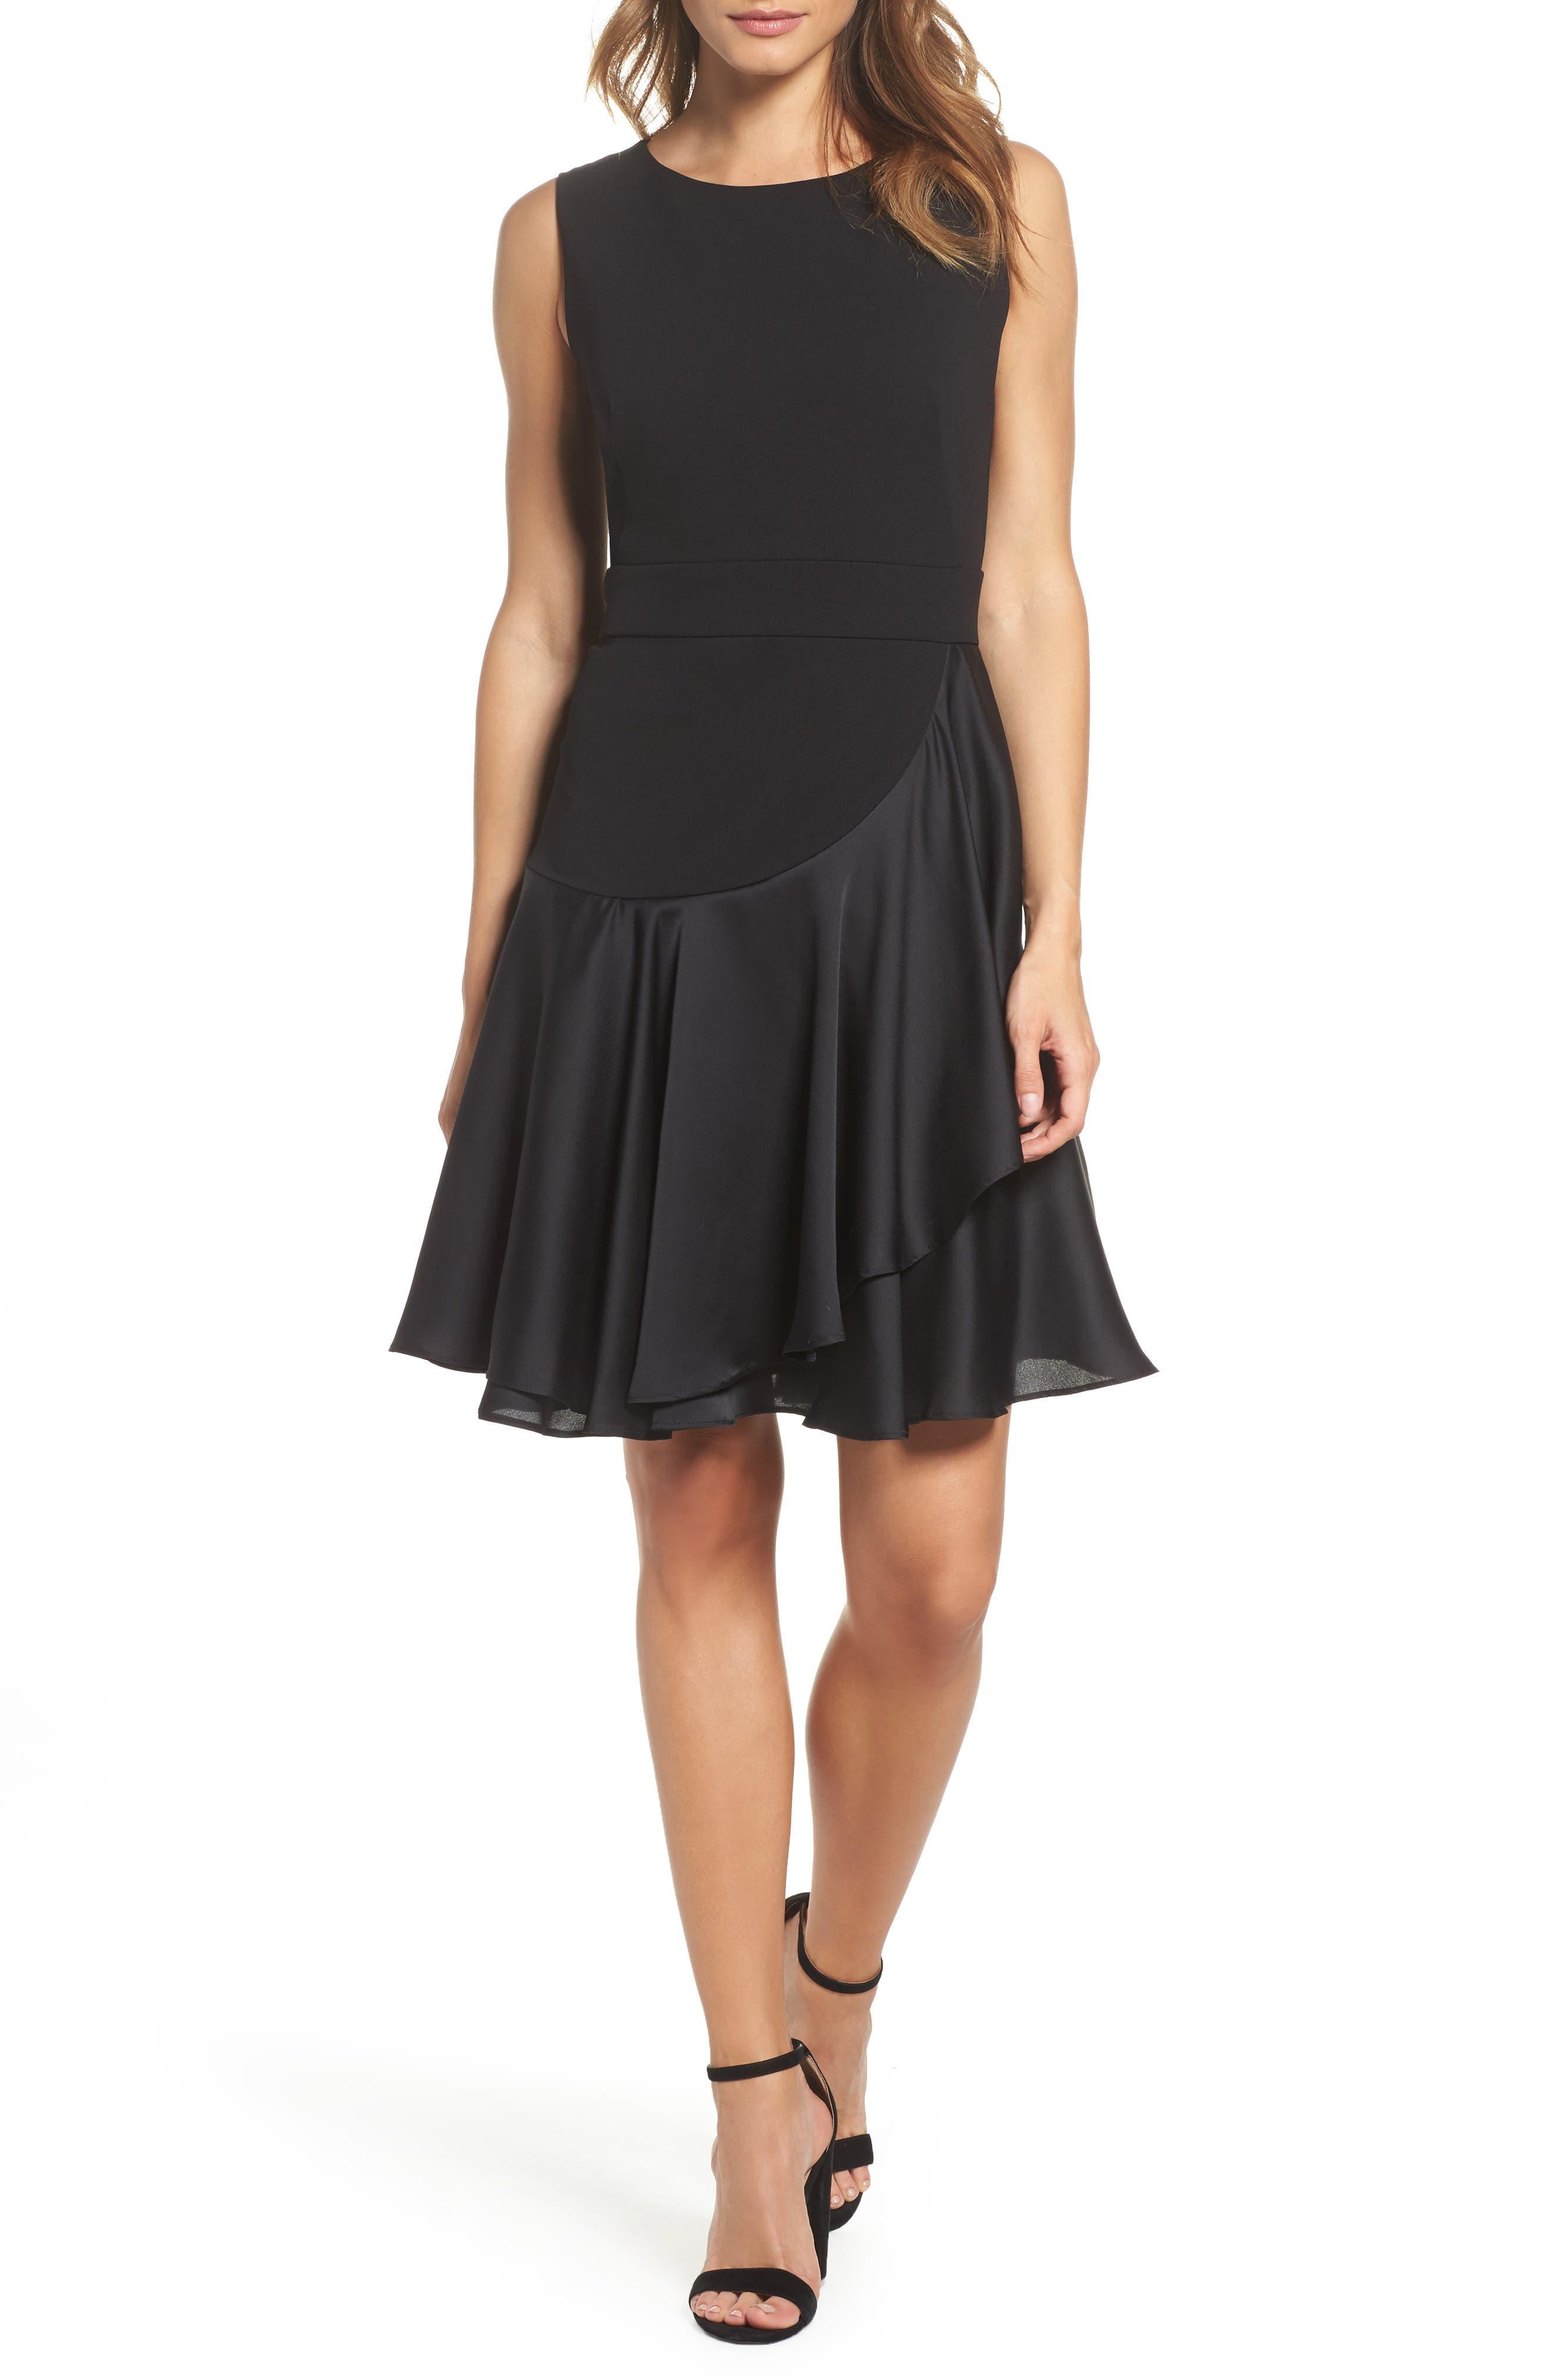 Alternate Image 1 Selected - Taylor Dresses Ruffle Hem Fit & Flare Dress